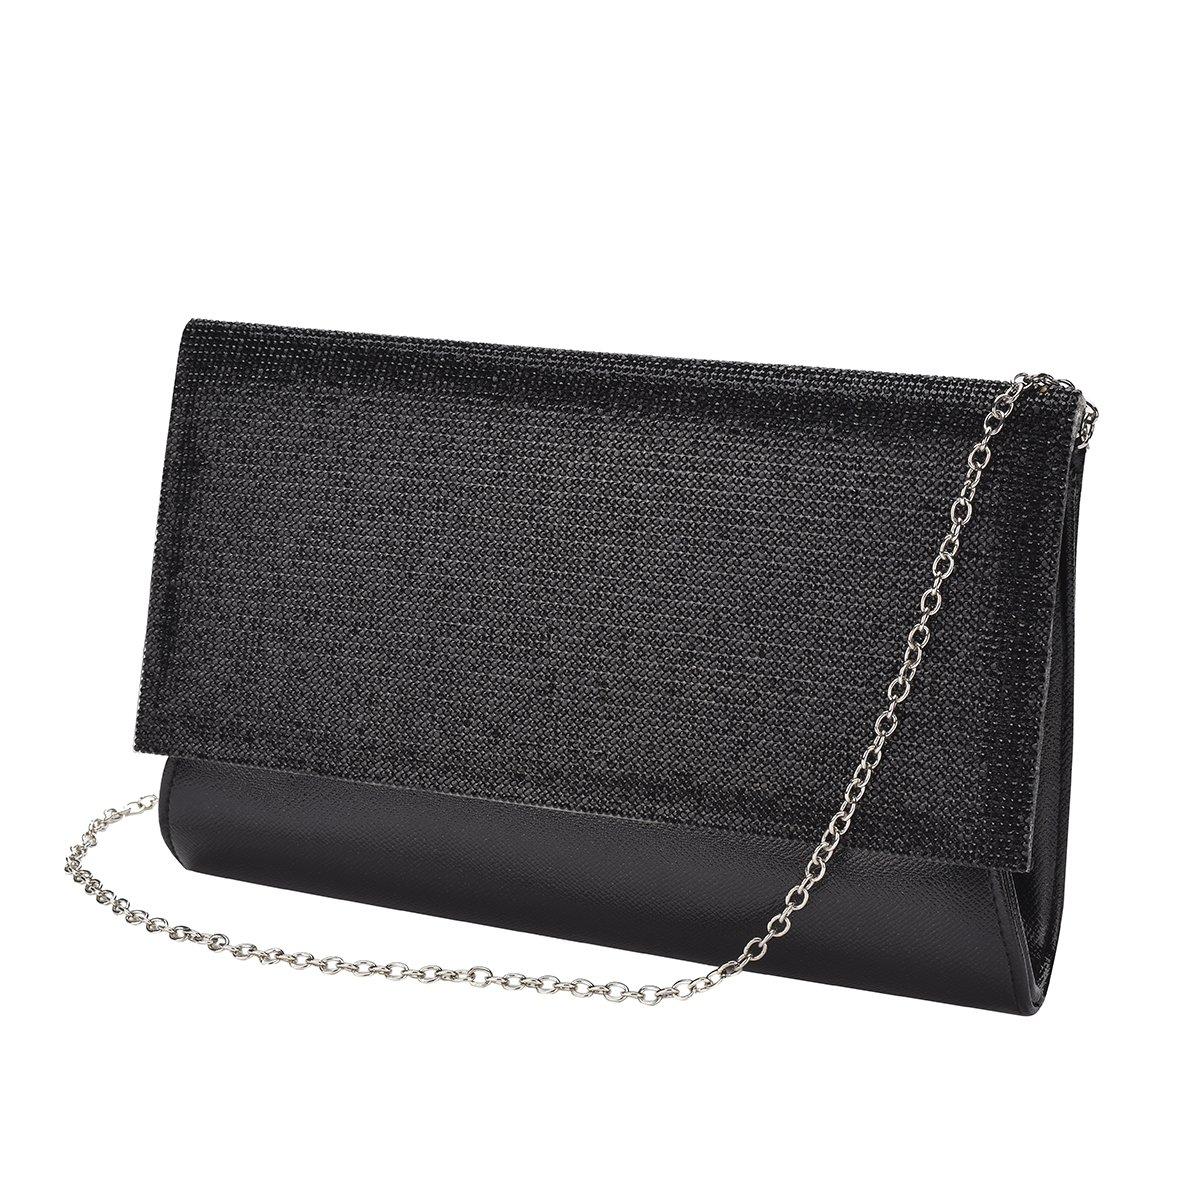 Vavabox Fashion Women Sparkly Rhinestone Evening Clutch Purse Wedding Party Handbag (black)